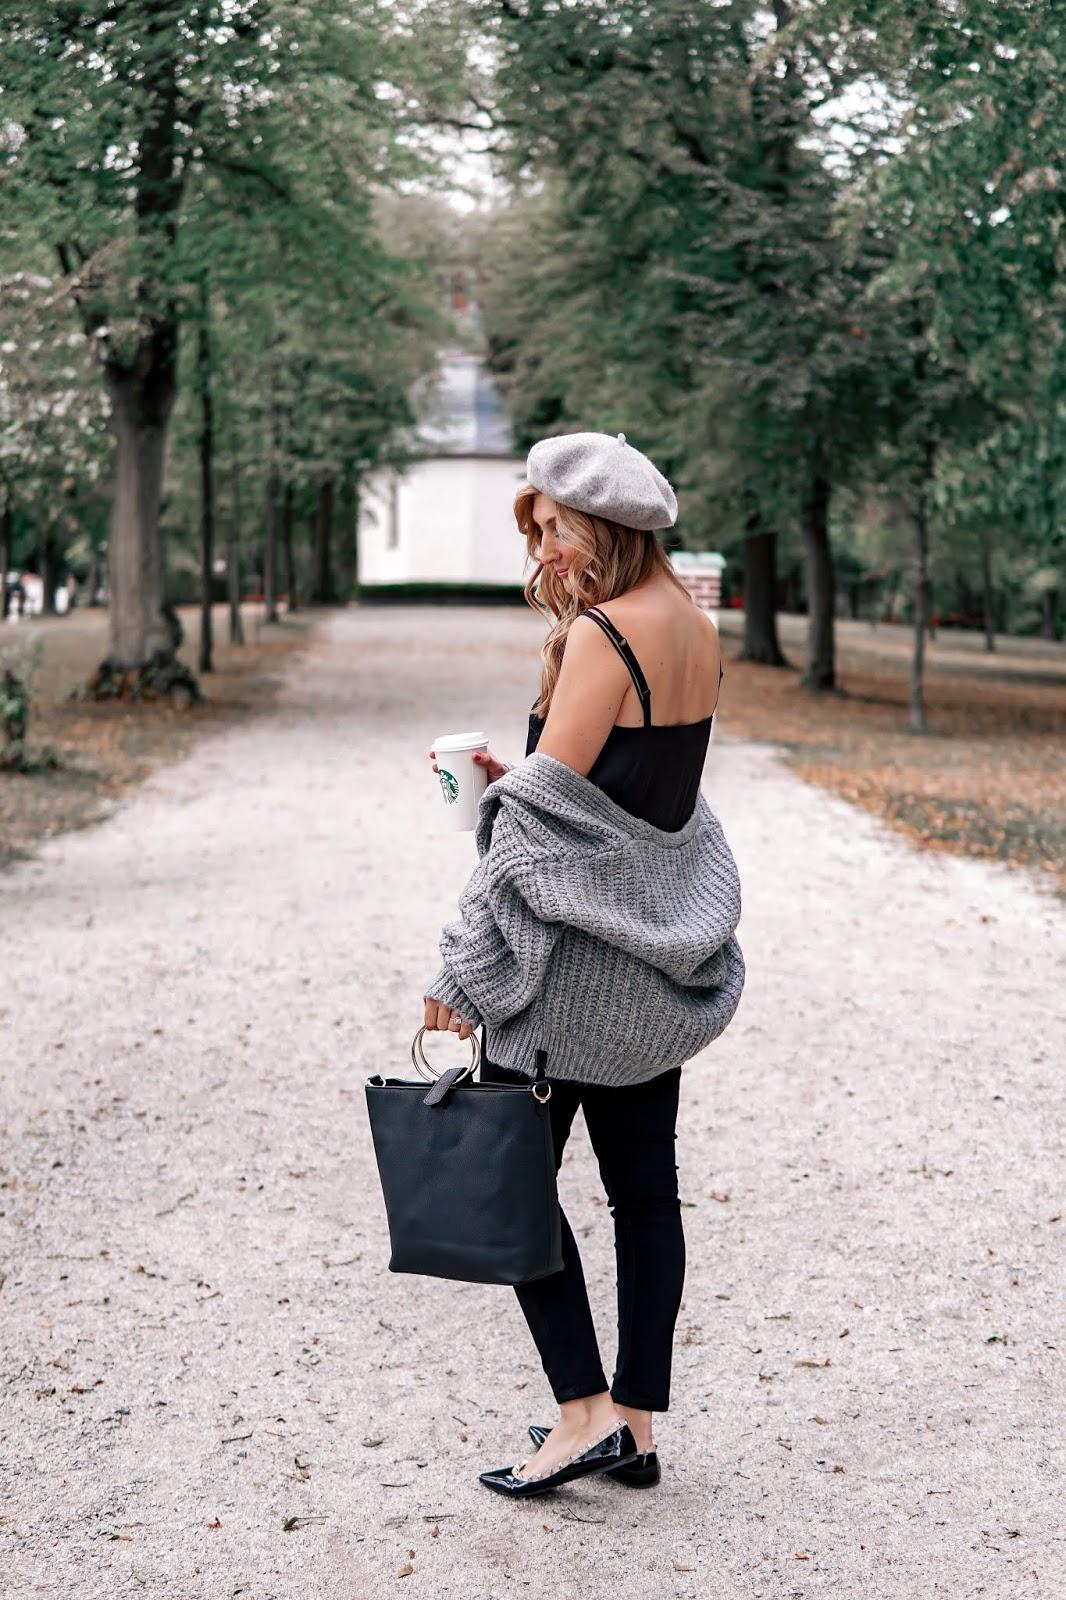 baskenmütze-grau-graue-baskenmütze-grauer-cardigan-schwarze-spitze-nieten-schuhe-fashionstylebyjohanna